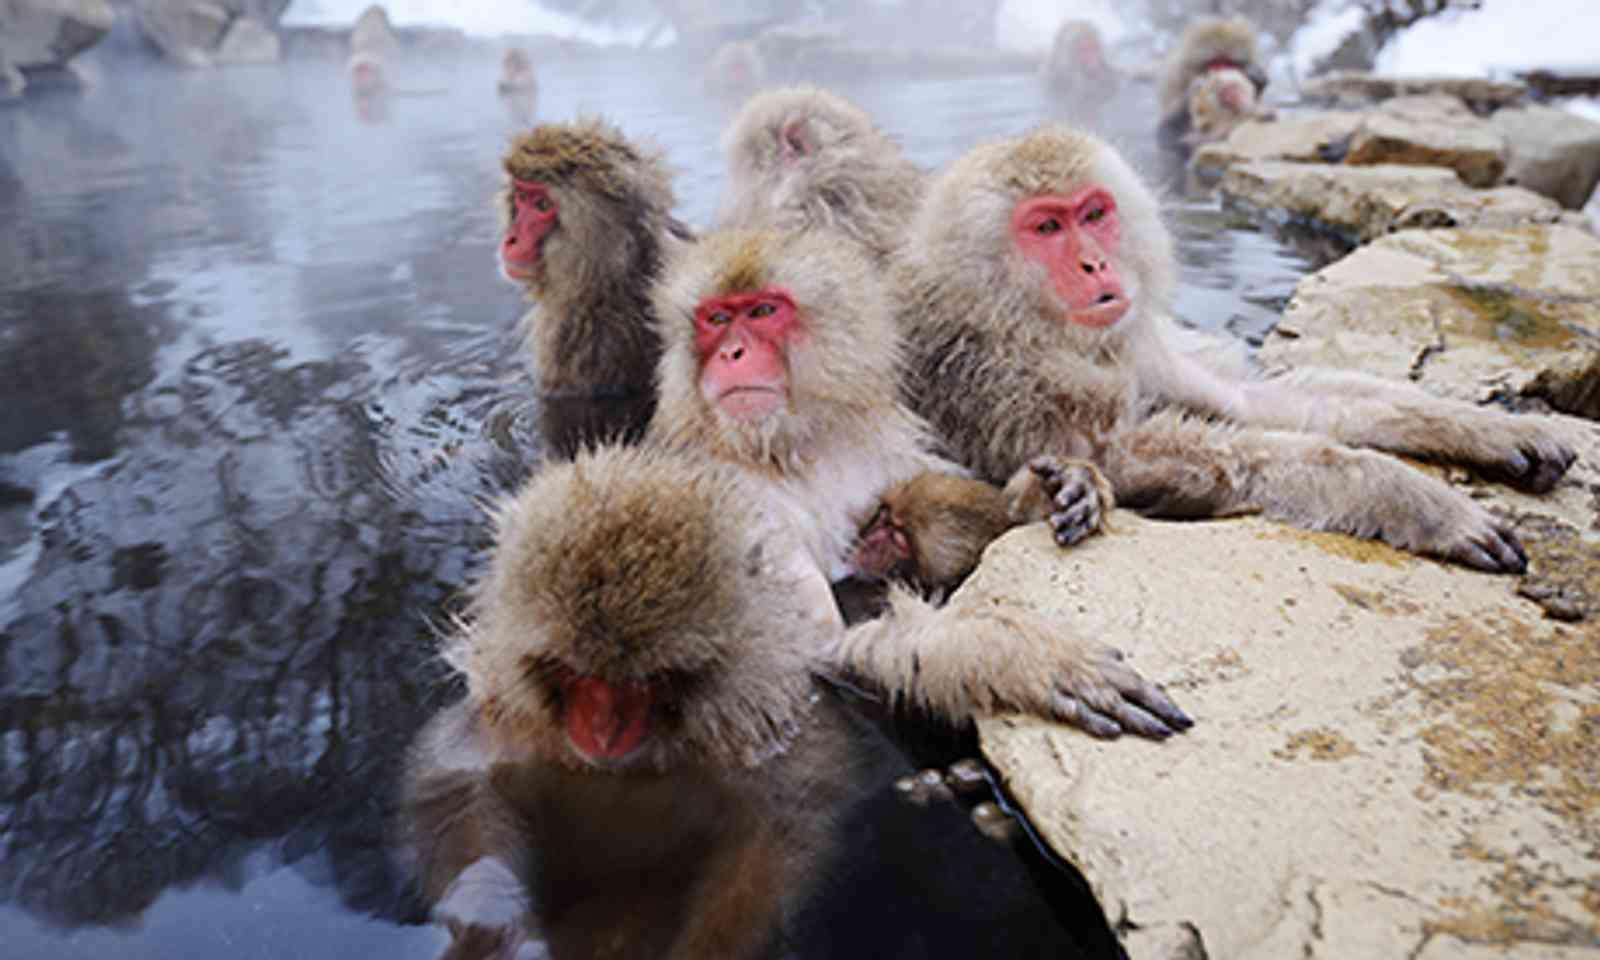 Snow Monkeys (Shutterstock.com)